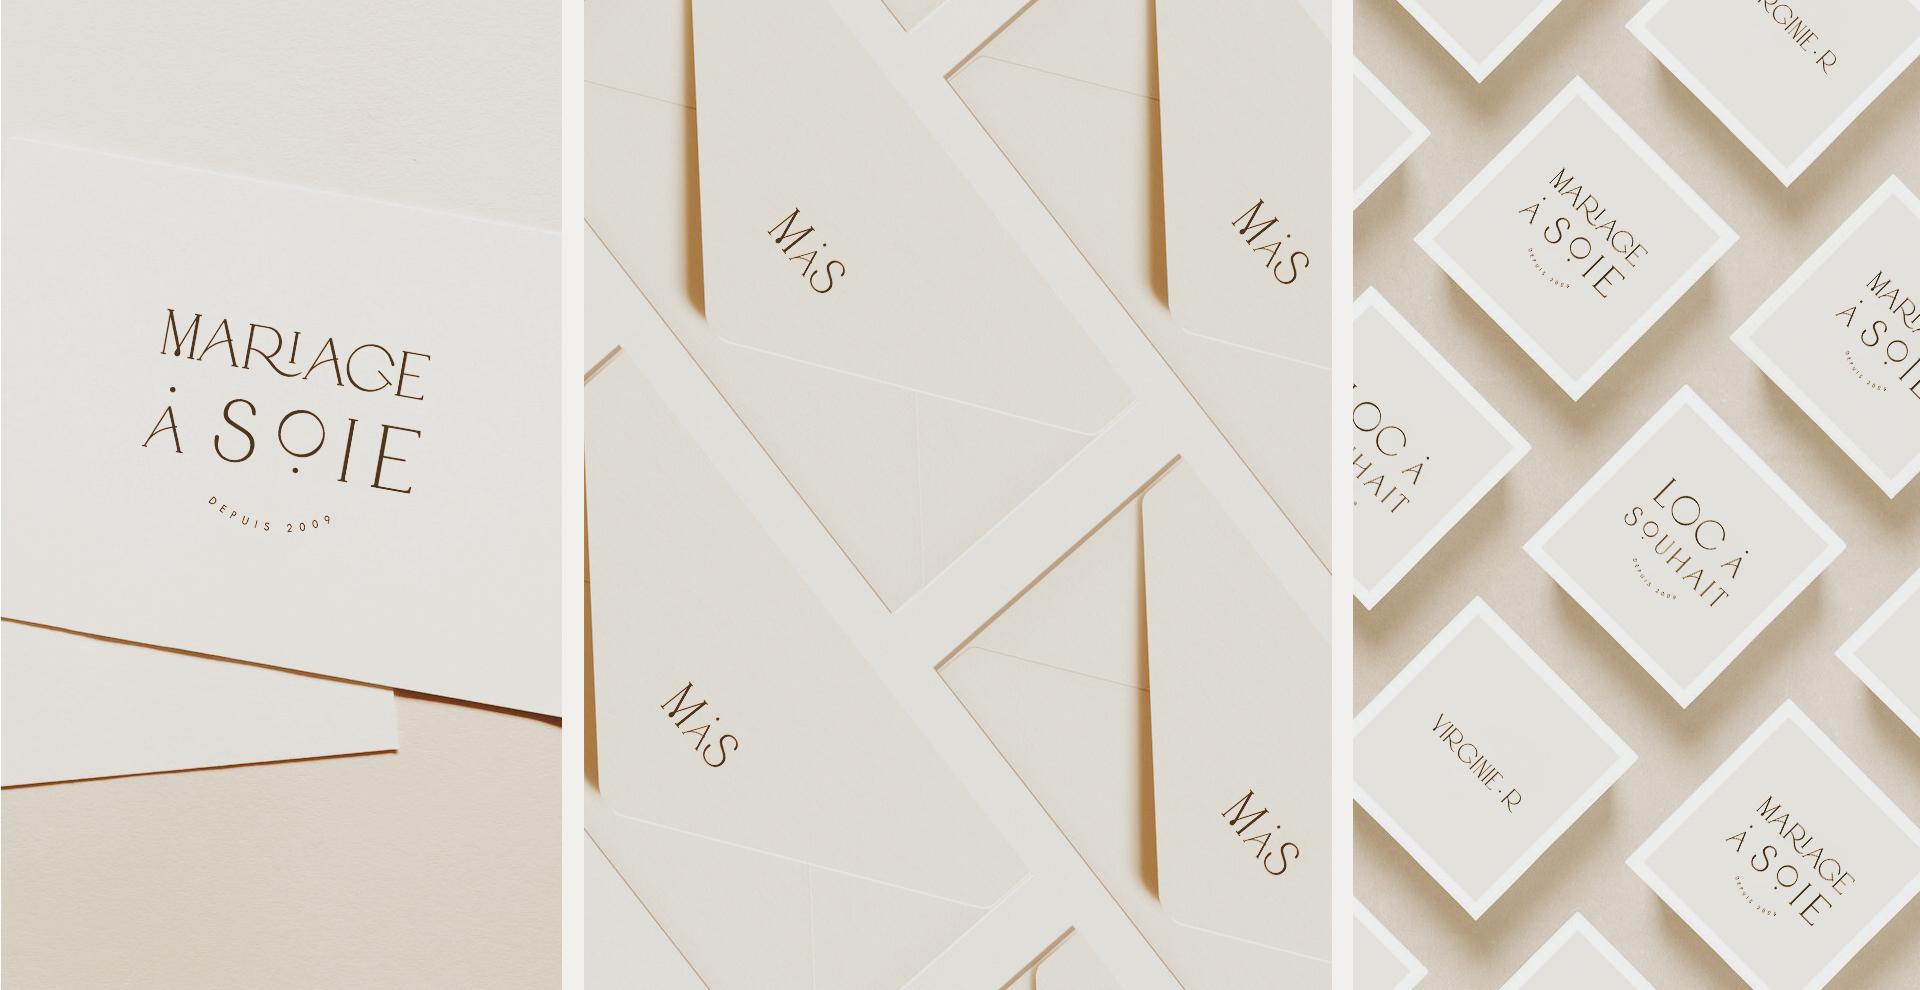 Mariage à Soie wedding planner stationary logo logotype